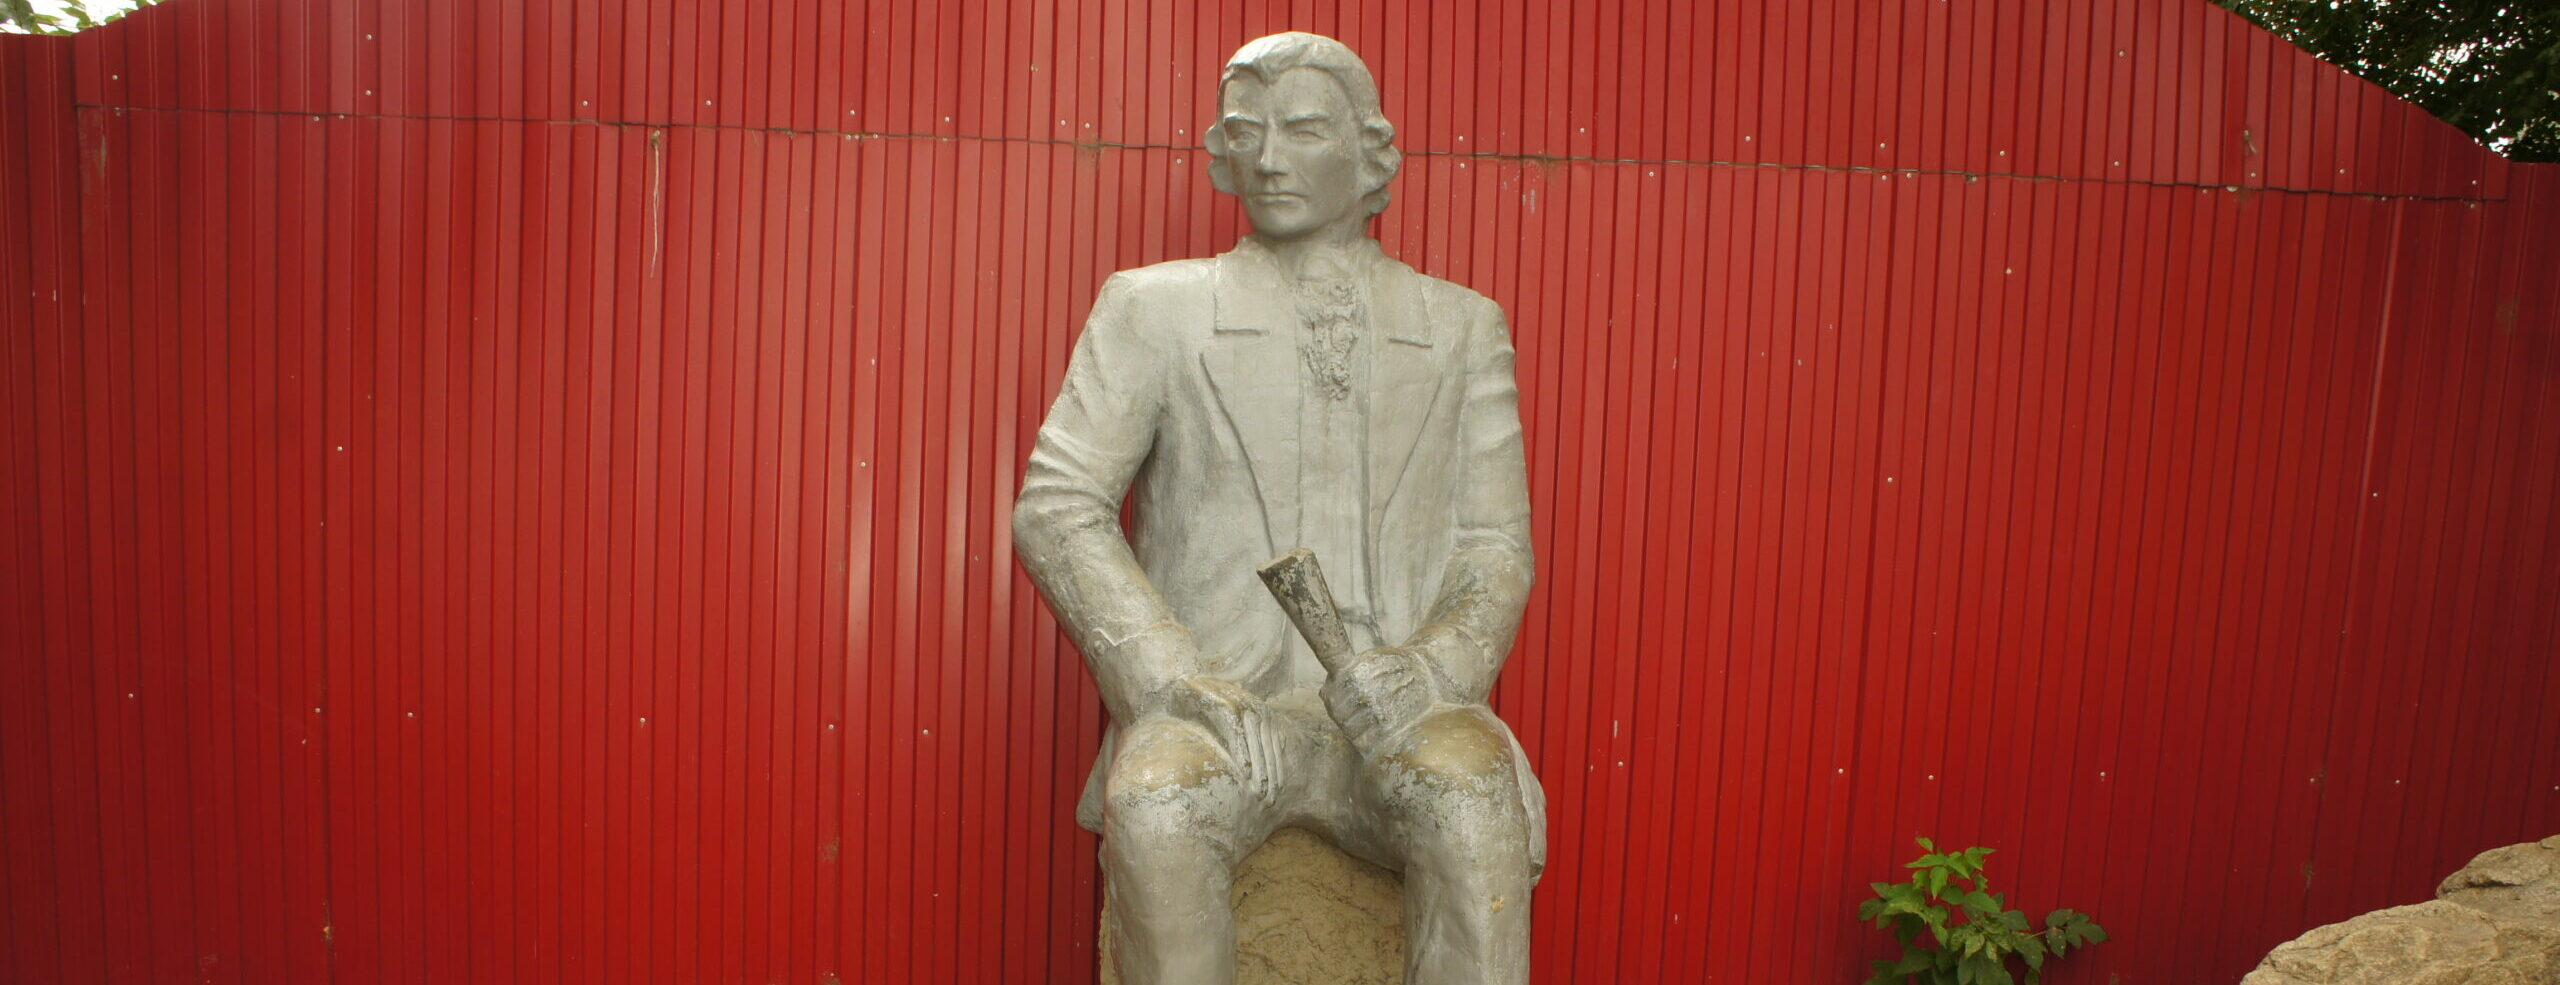 Памятник Колумбу Оренбургского края